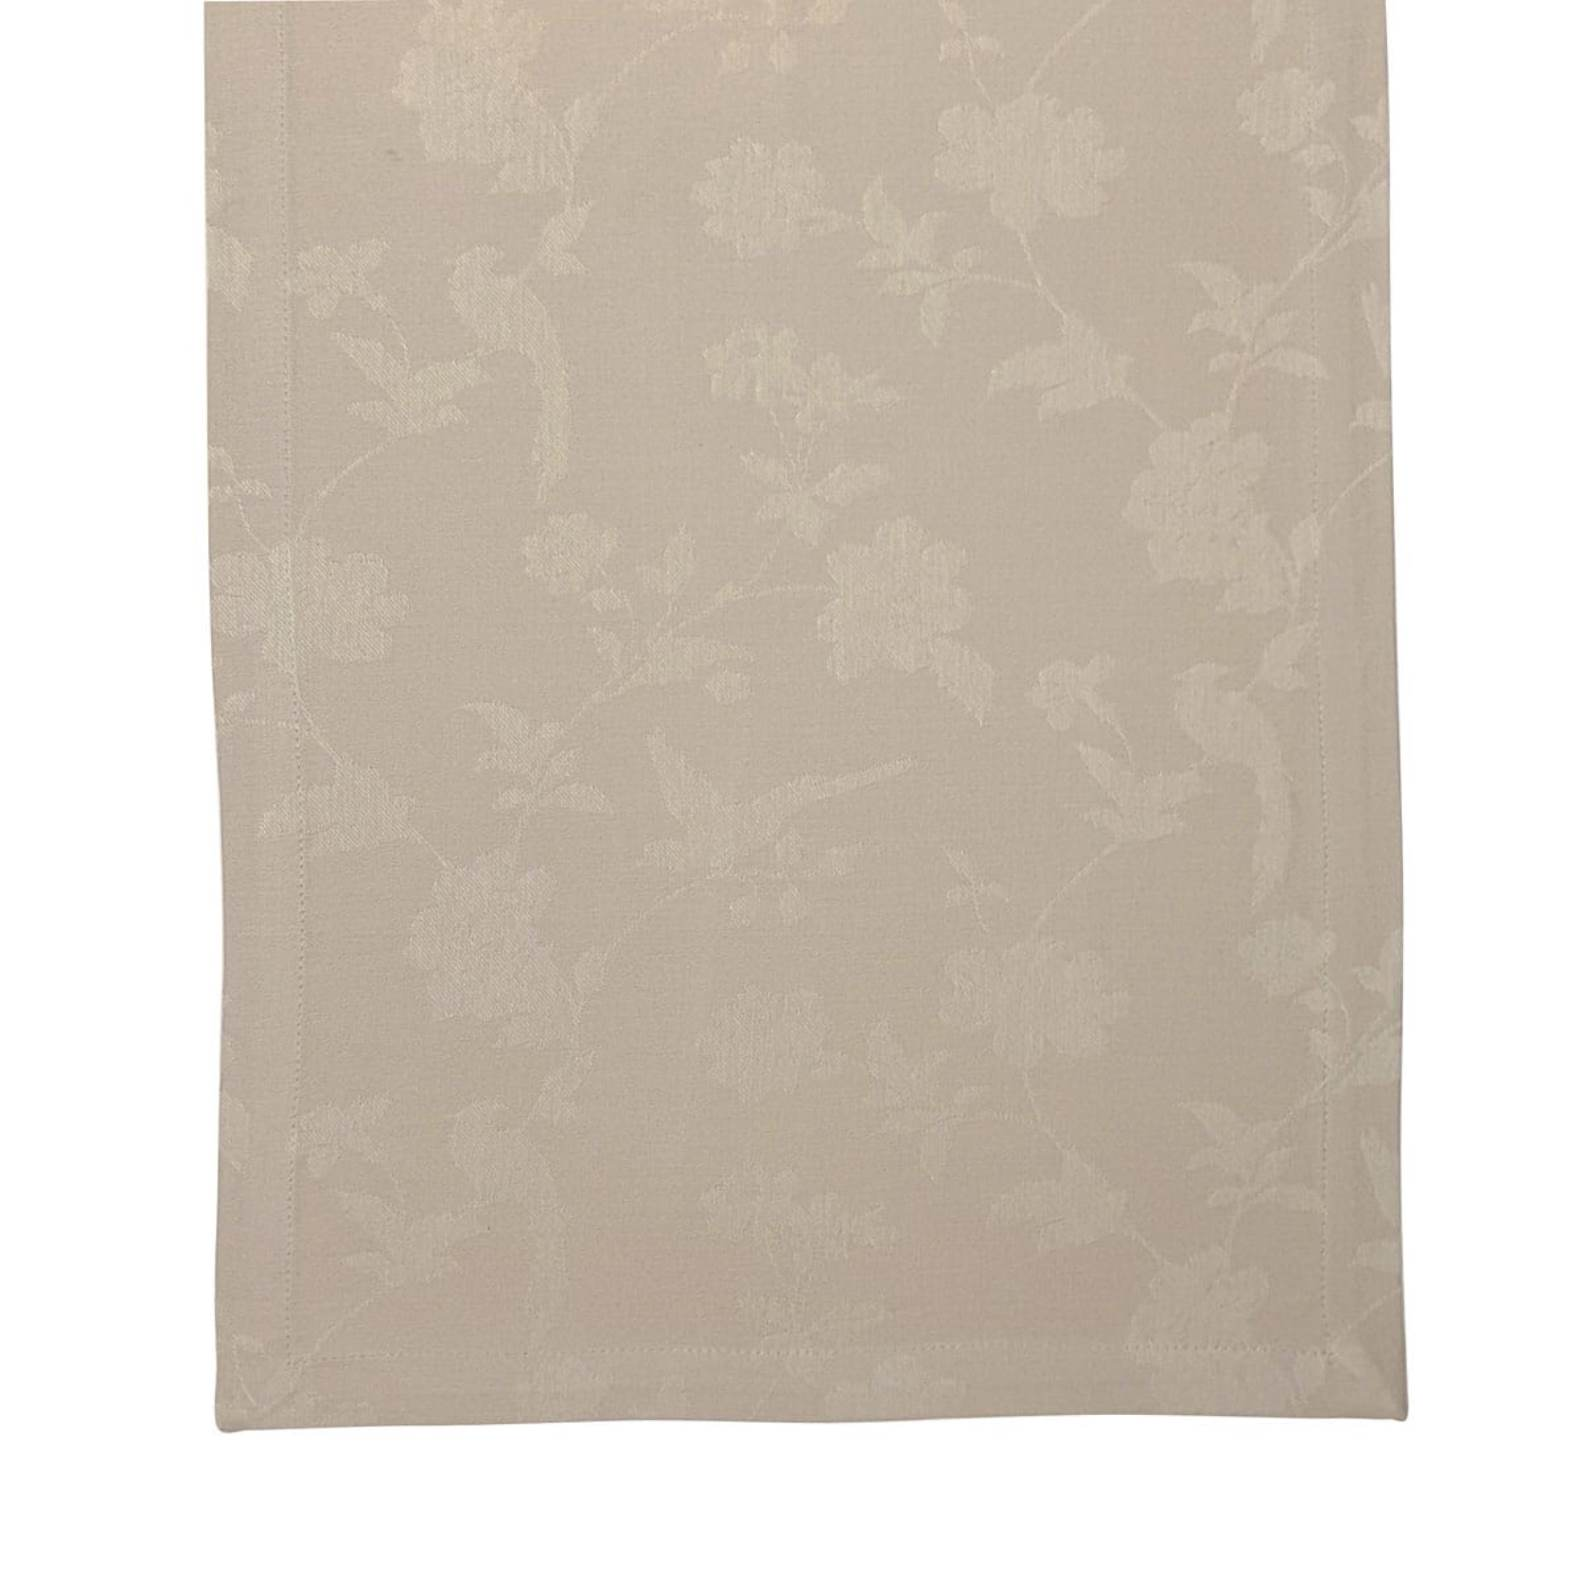 Онлайн каталог PROMENU: Скатерть Laura Ashley HERITAGE, 40х150 см, бежевый с цветами и птичками                               181000